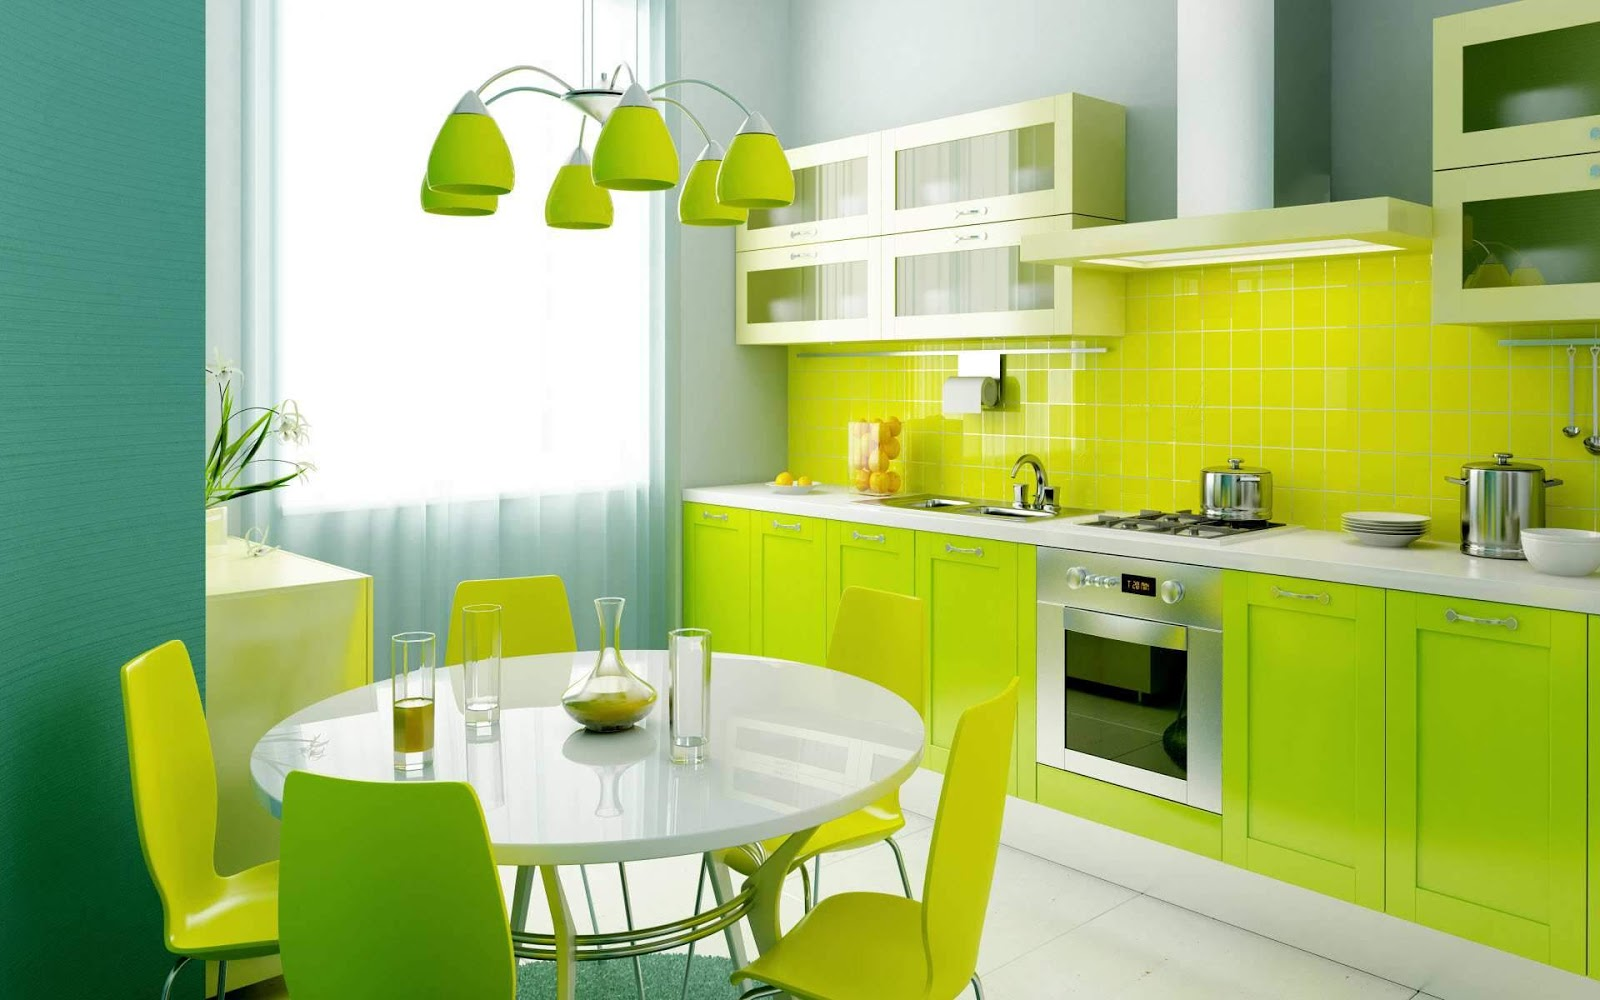 Desain Rumah Minimalis Modern: Green minimalist home interior ...